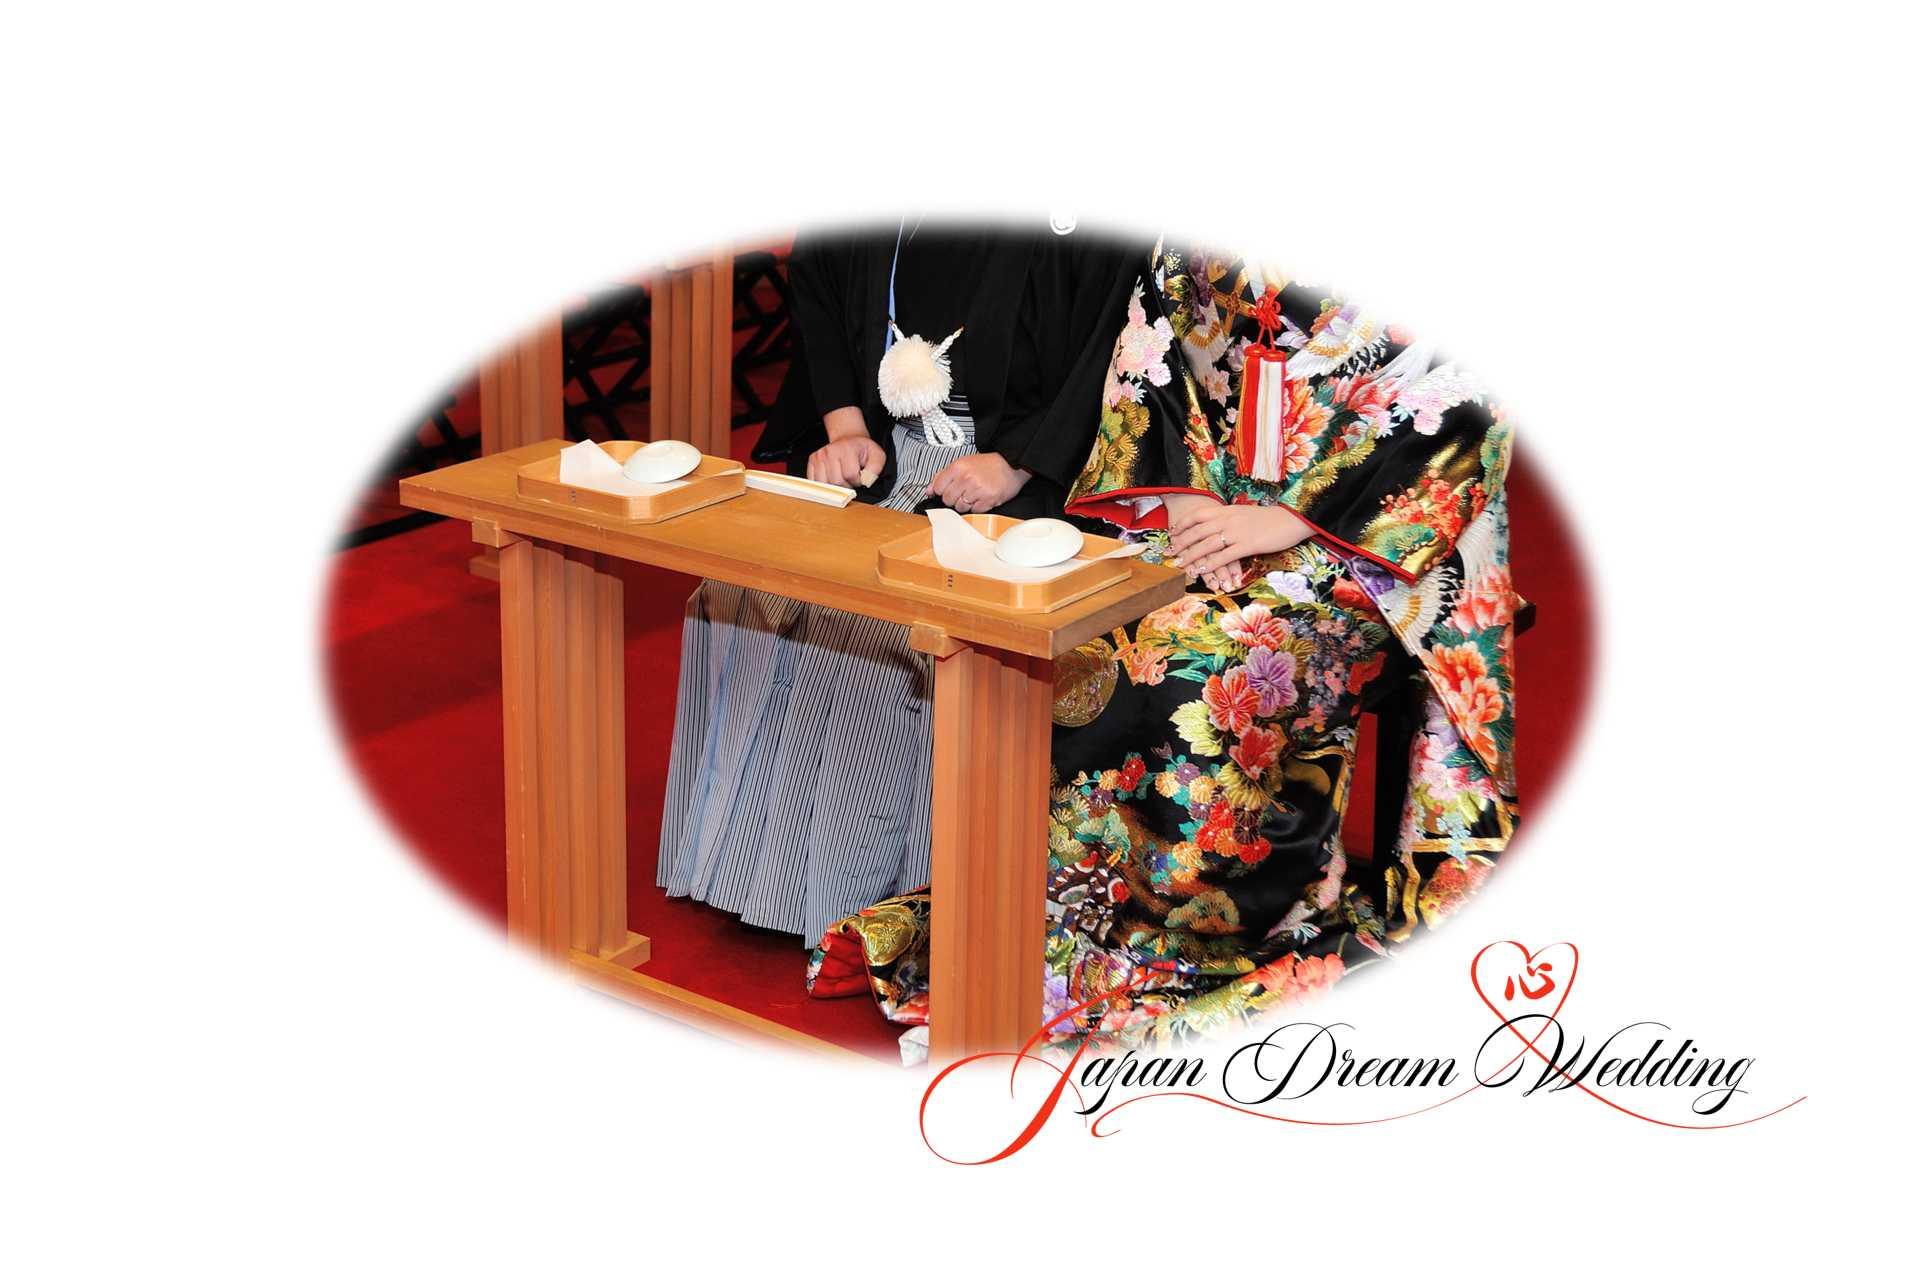 Japan Dream Wedding Ceremonial Guidance